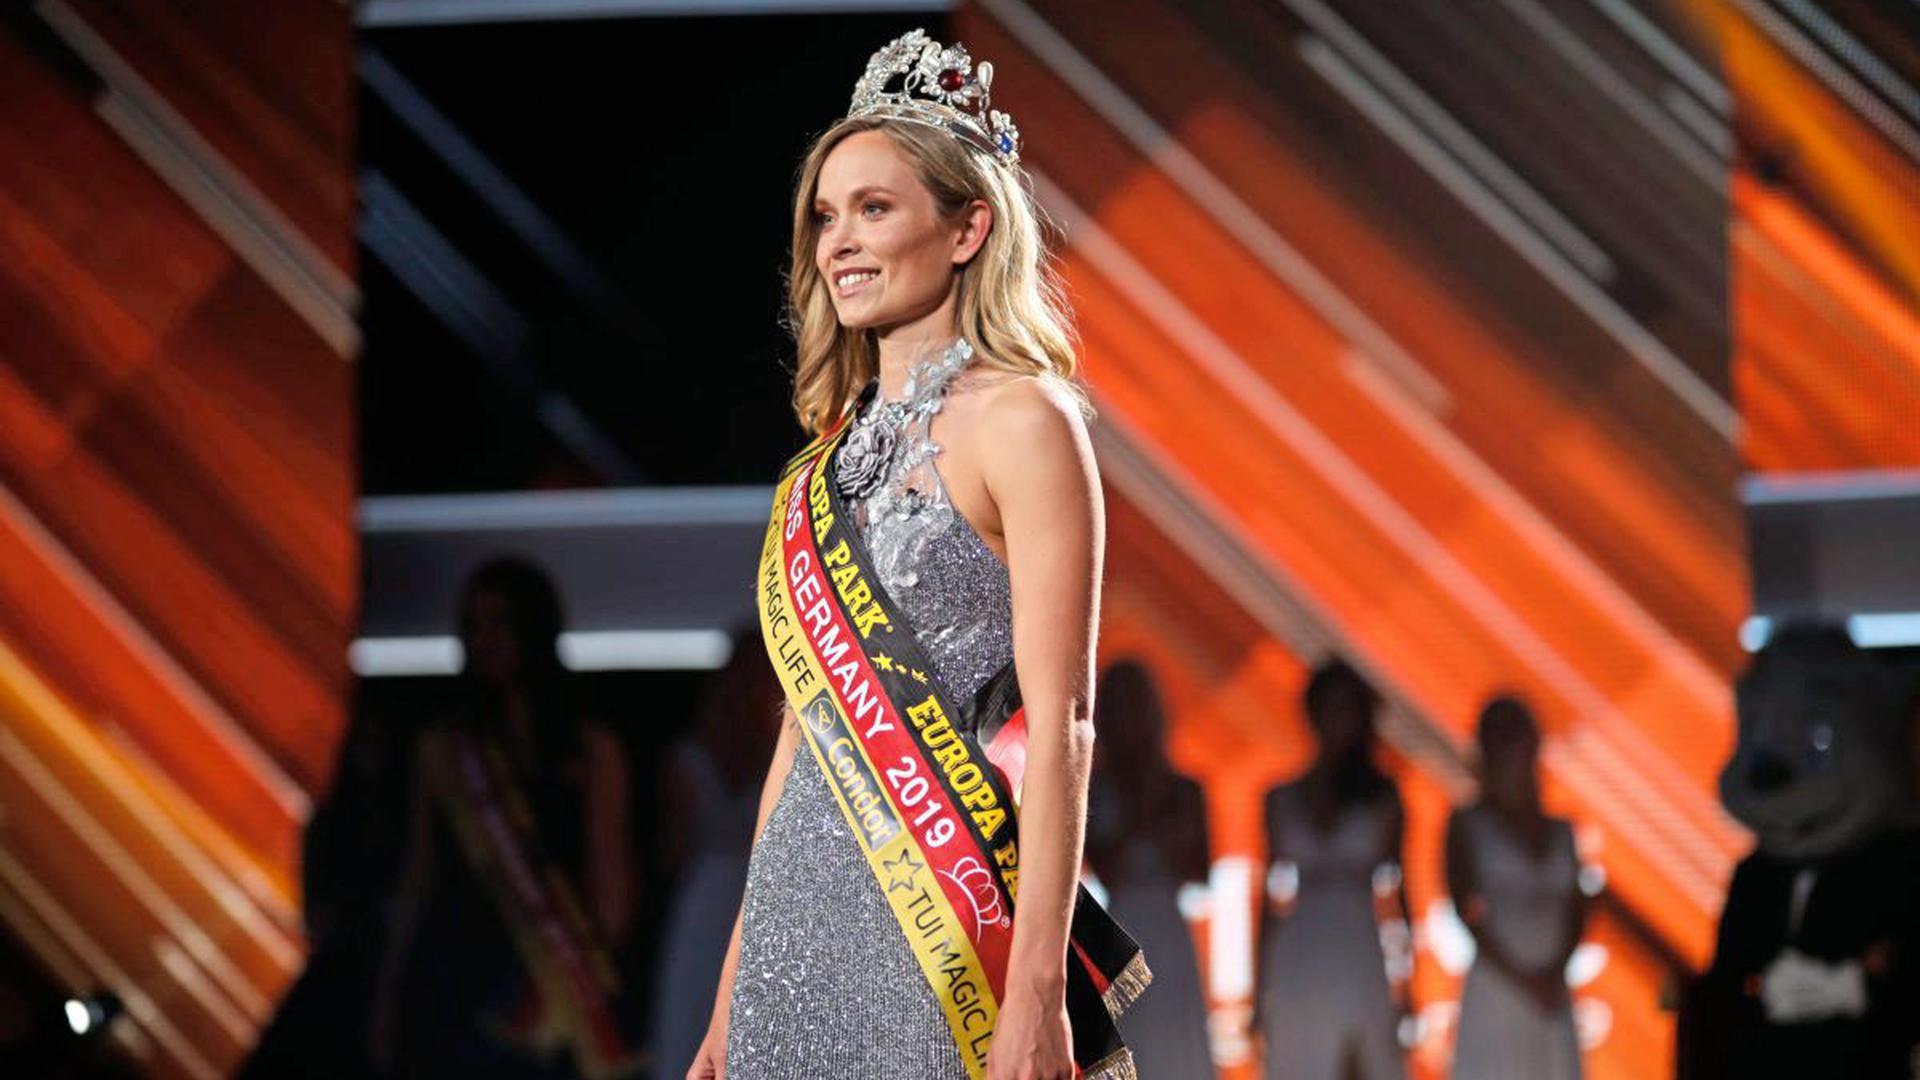 Miss Stuttgart